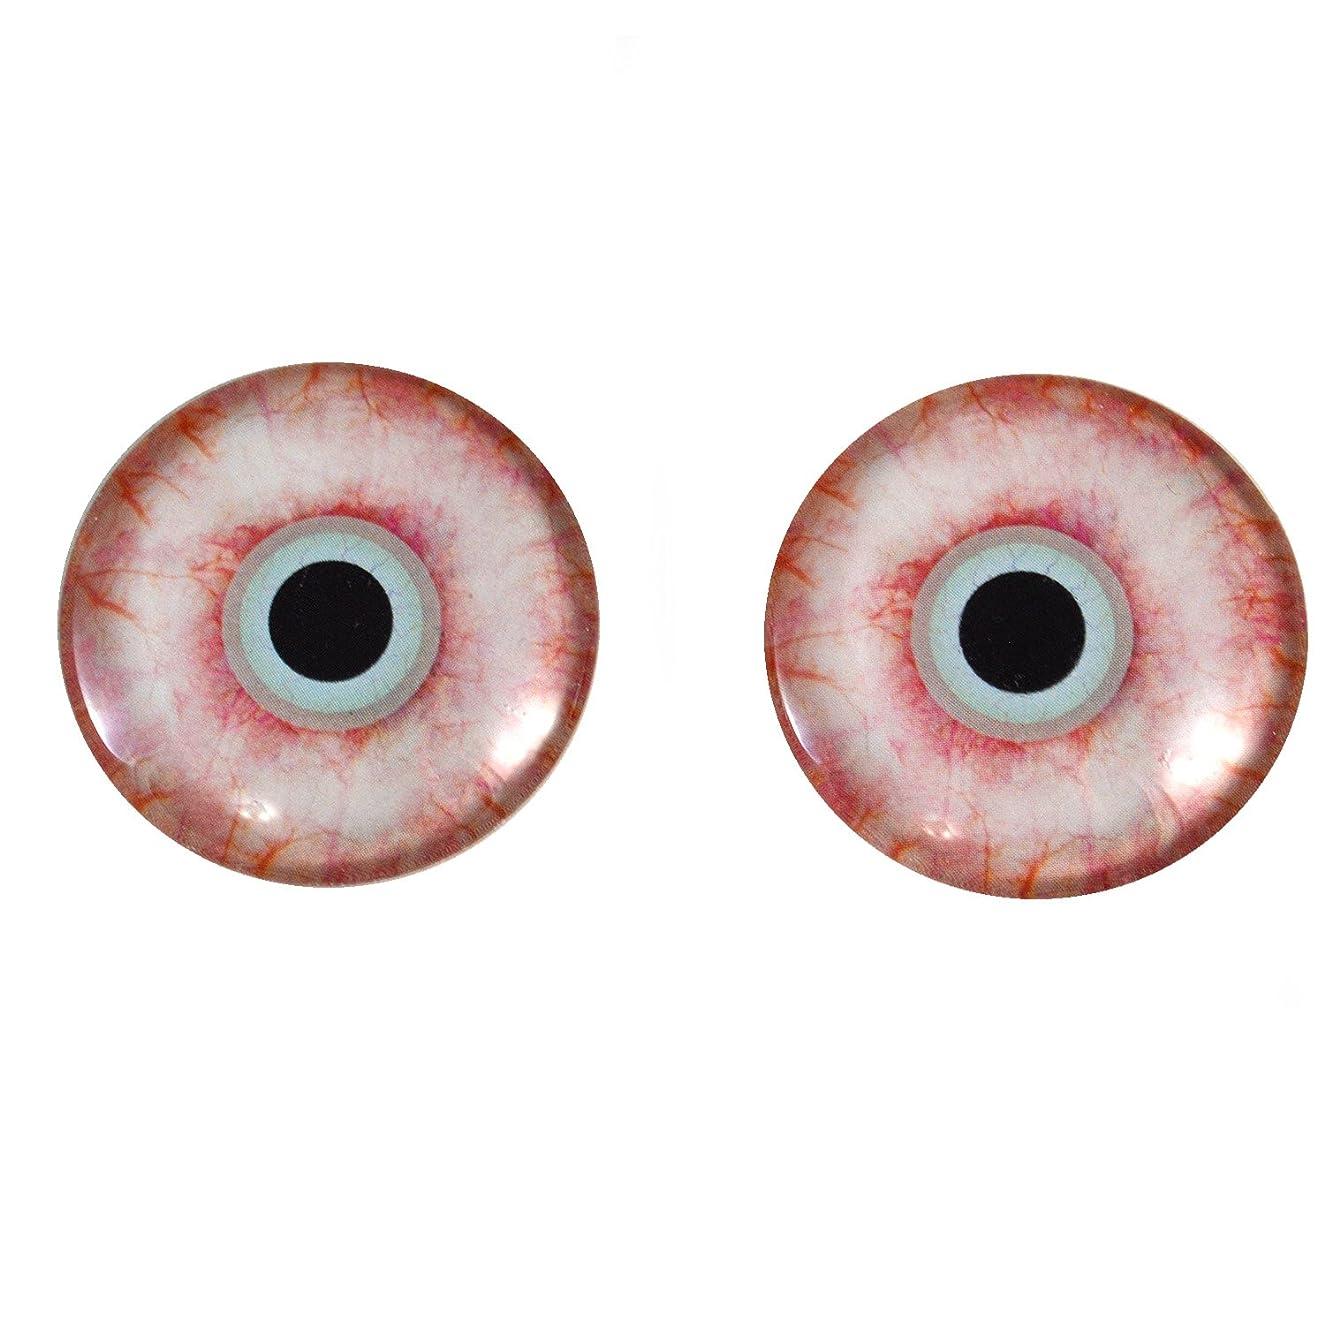 40mm Pair of Large Bloodshot Zombie Horror Glass Eyes